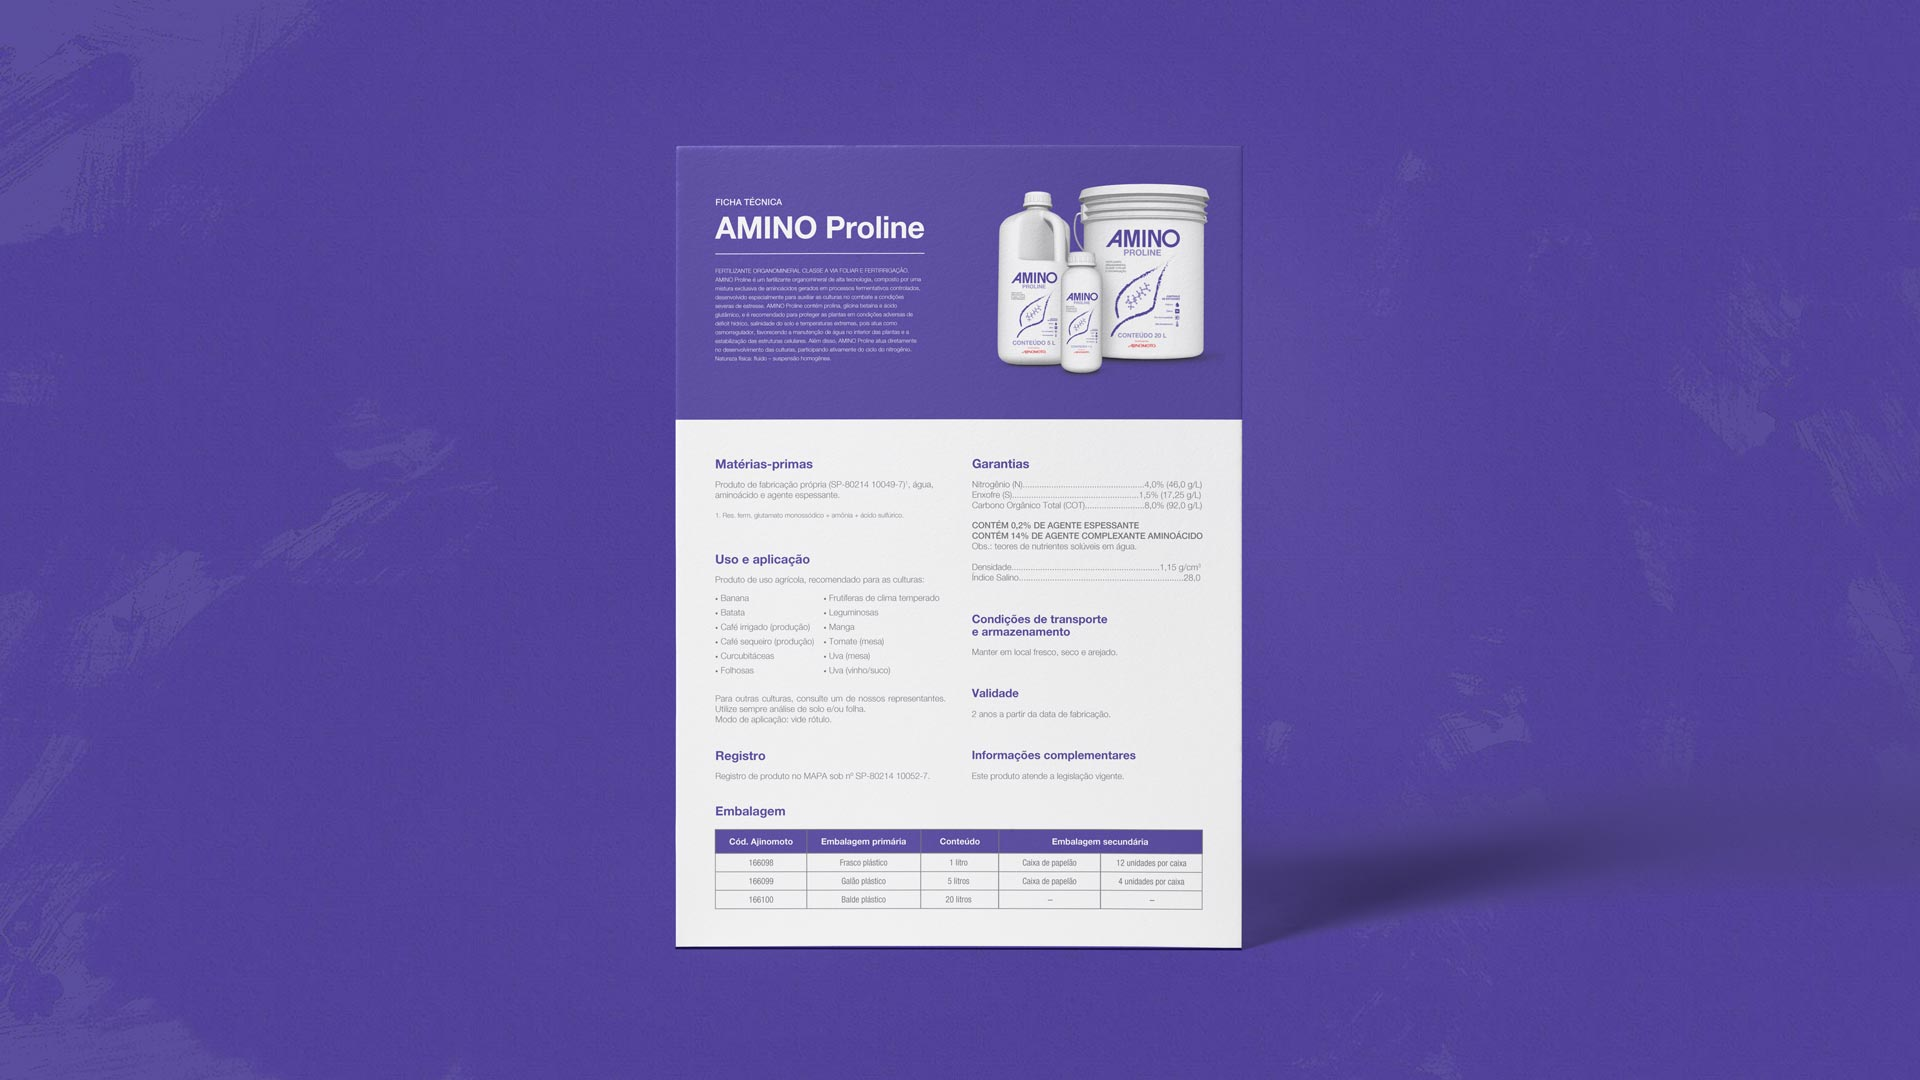 icha-tecnica-amino.jpg